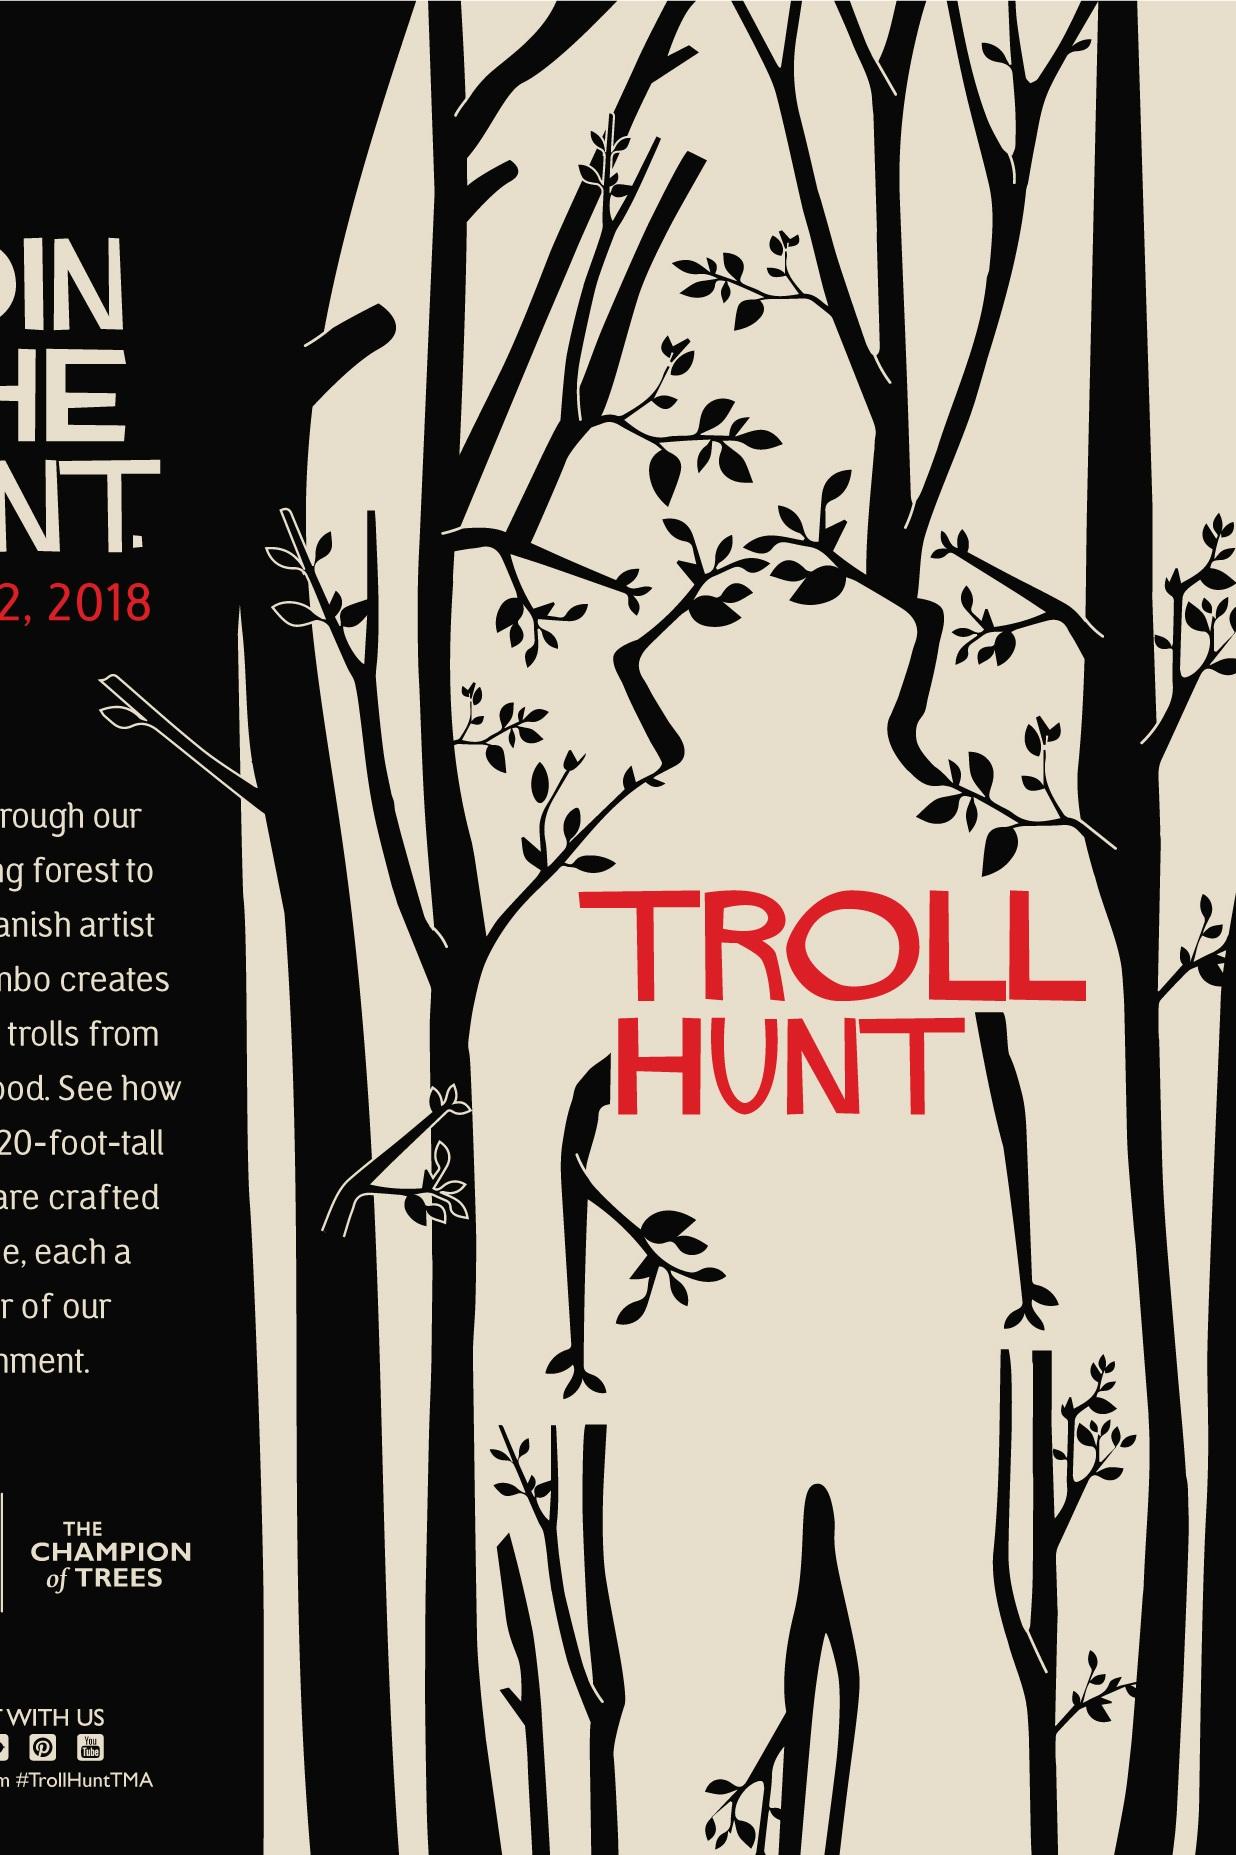 Troll-Hunt_Concept.jpg